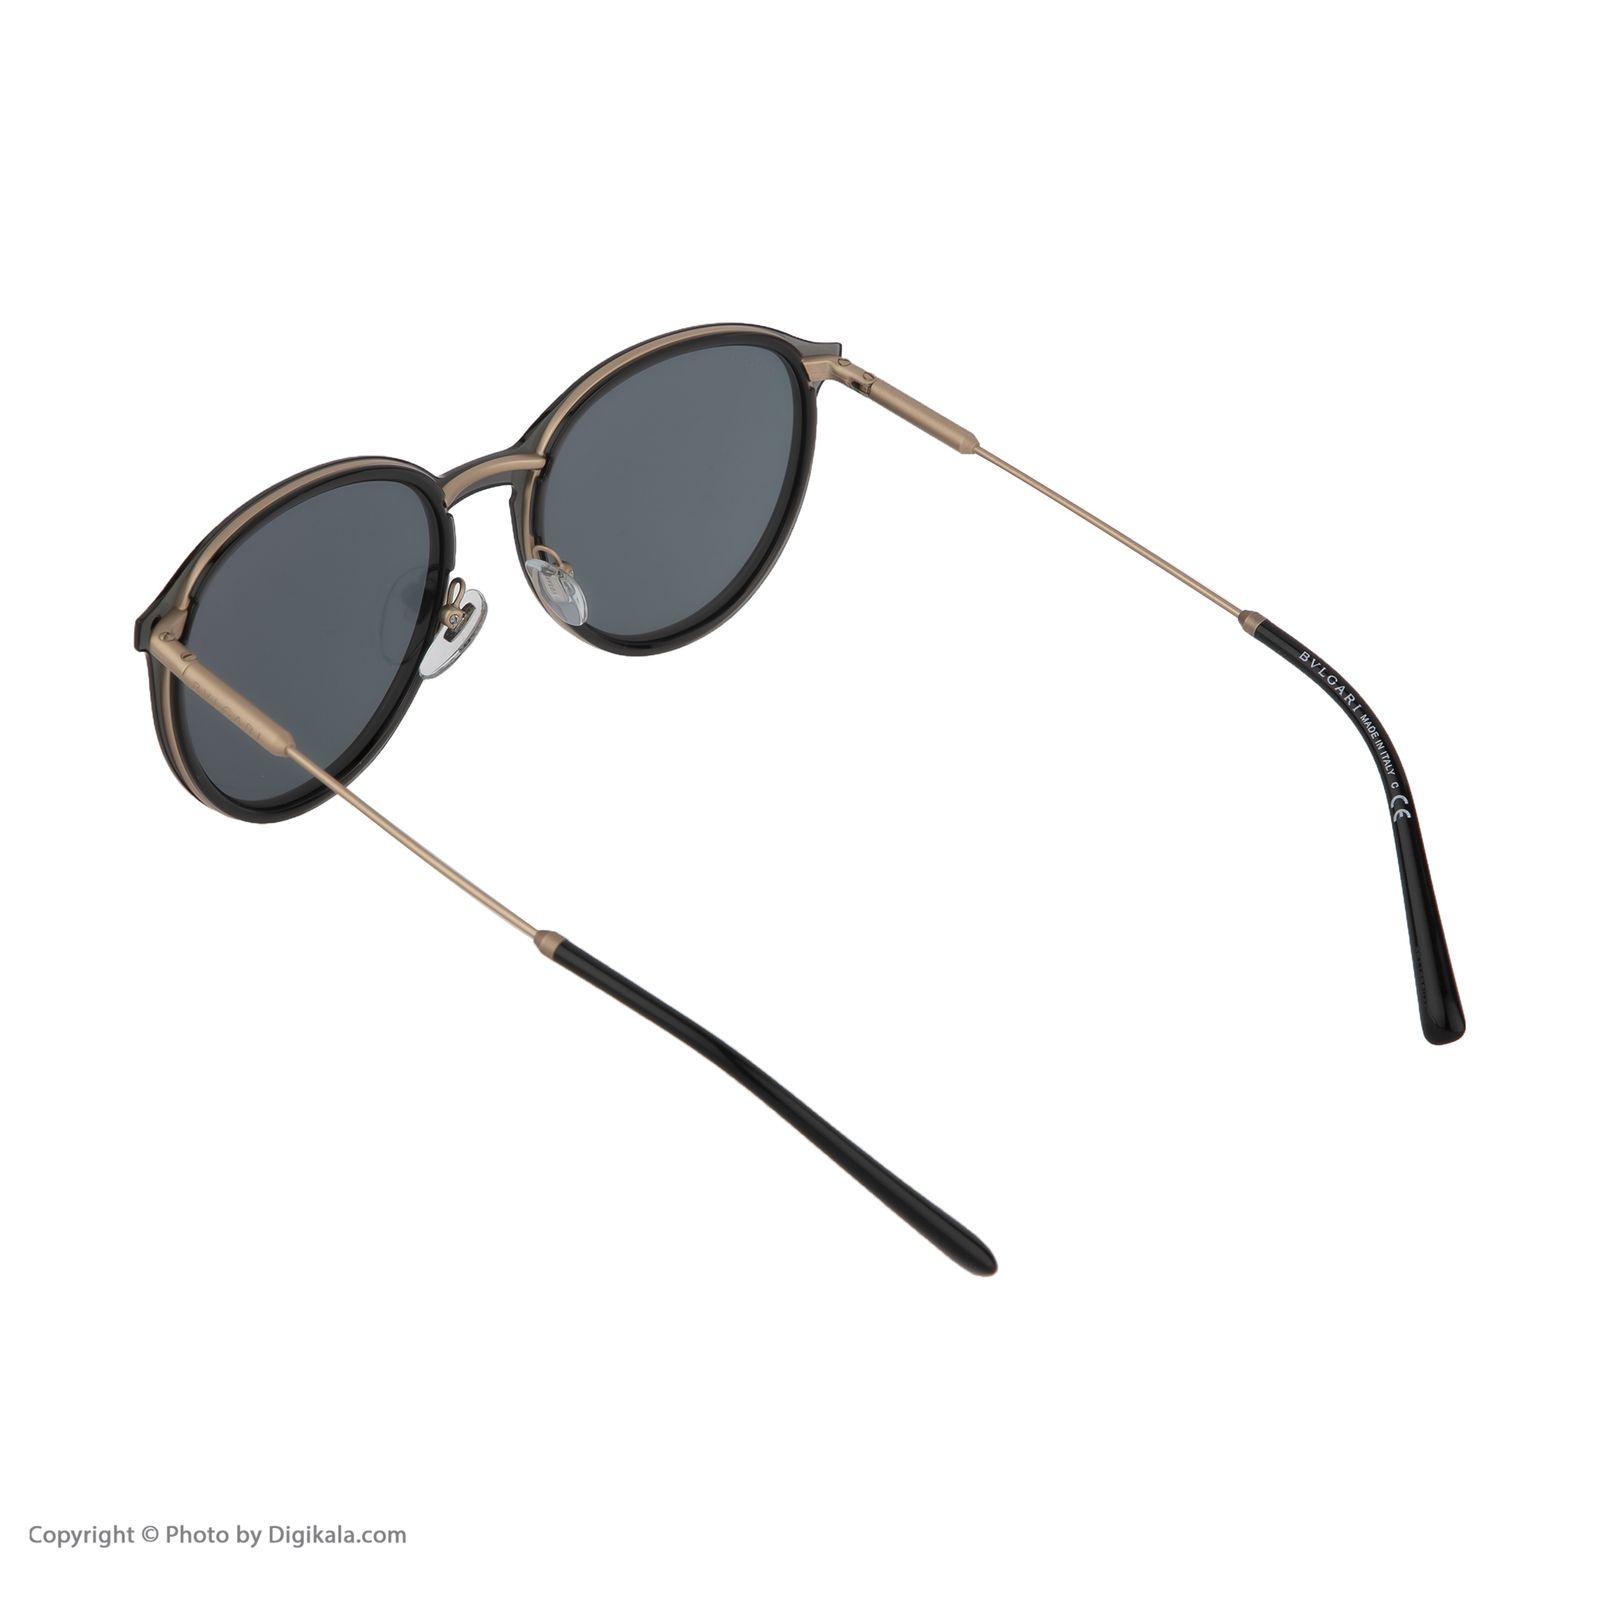 عینک آفتابی زنانه بولگاری مدل BV5045S 20134Z -  - 4